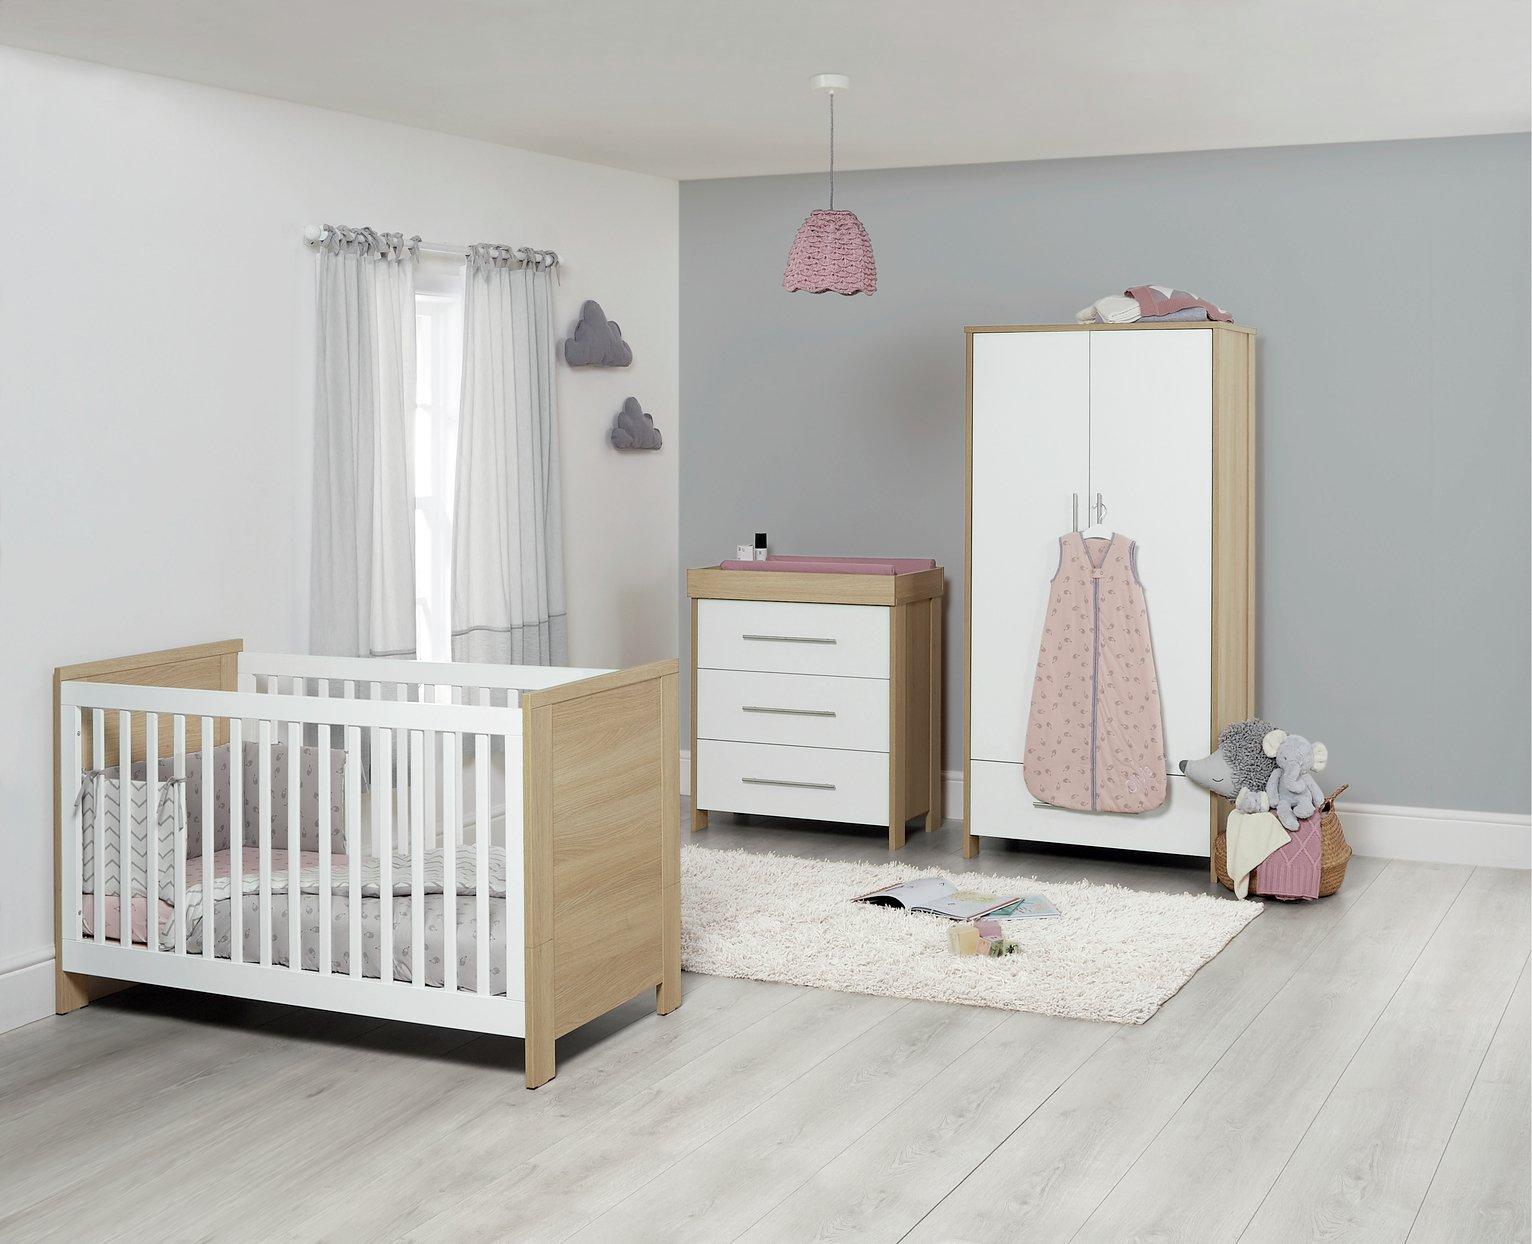 mamas papas harrow 3 piece furniture set grey. Black Bedroom Furniture Sets. Home Design Ideas